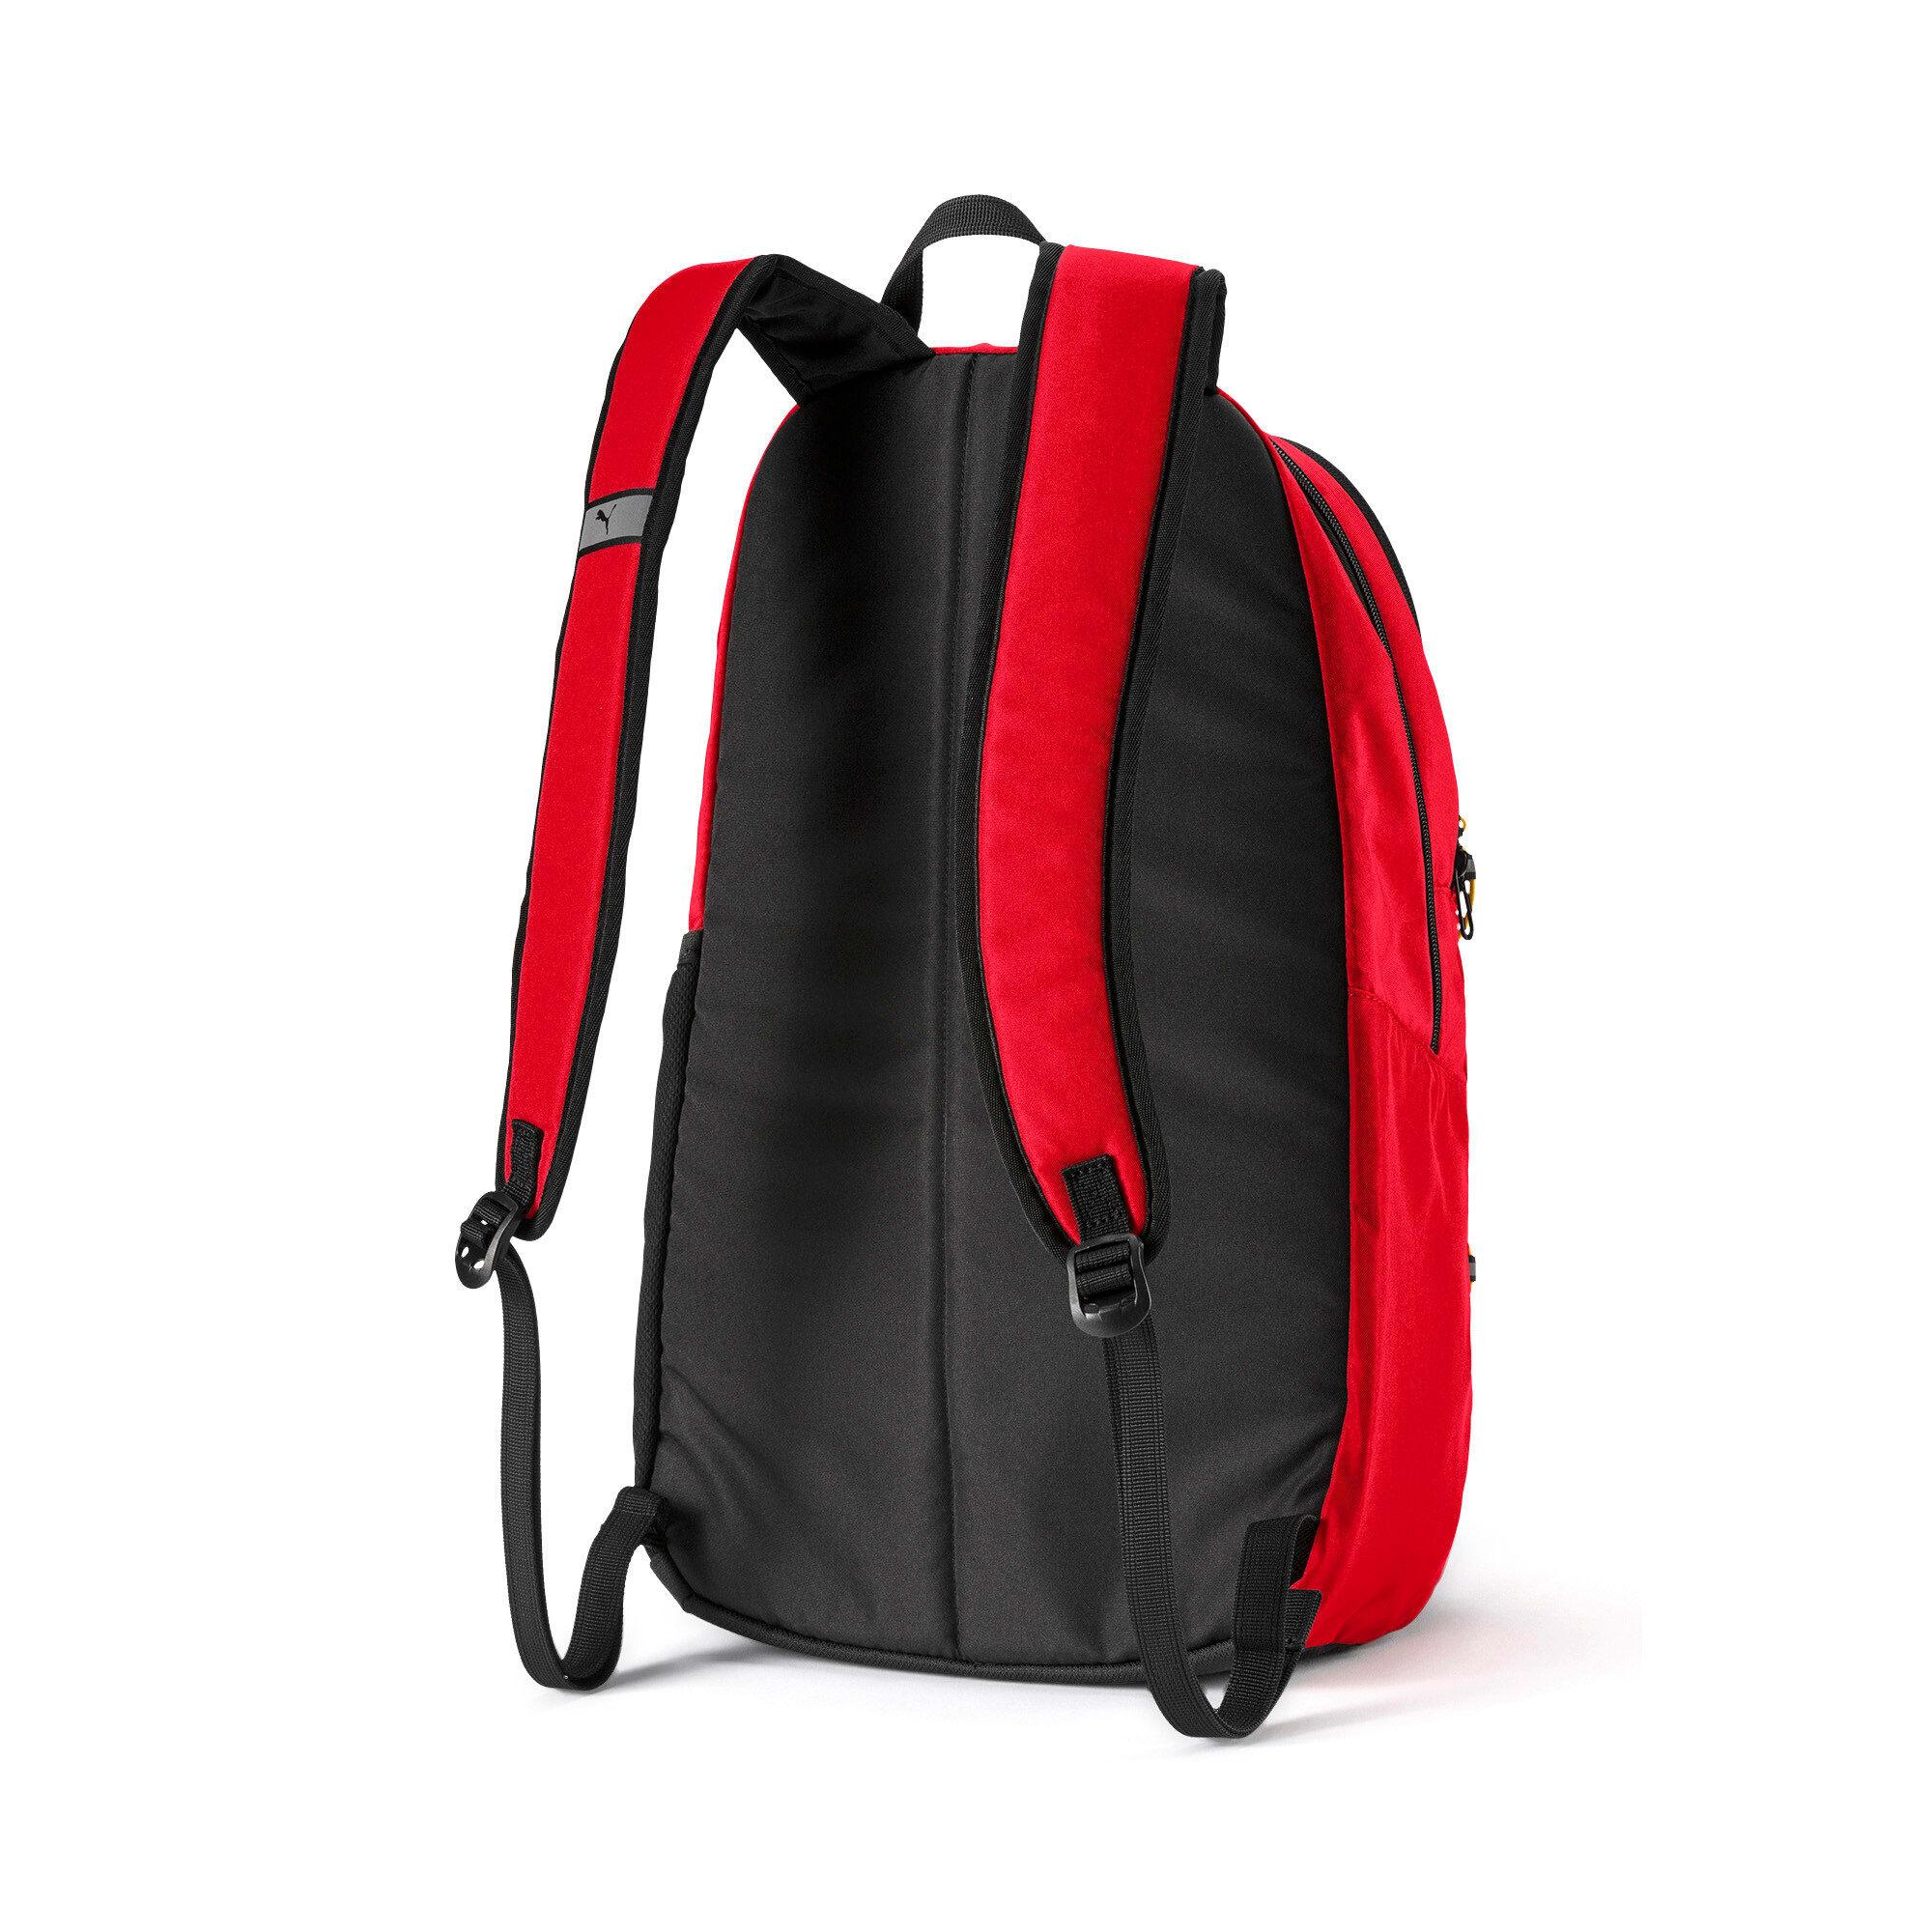 Thumbnail 2 of Ferrari Fanwear Backpack, Rosso Corsa, medium-IND